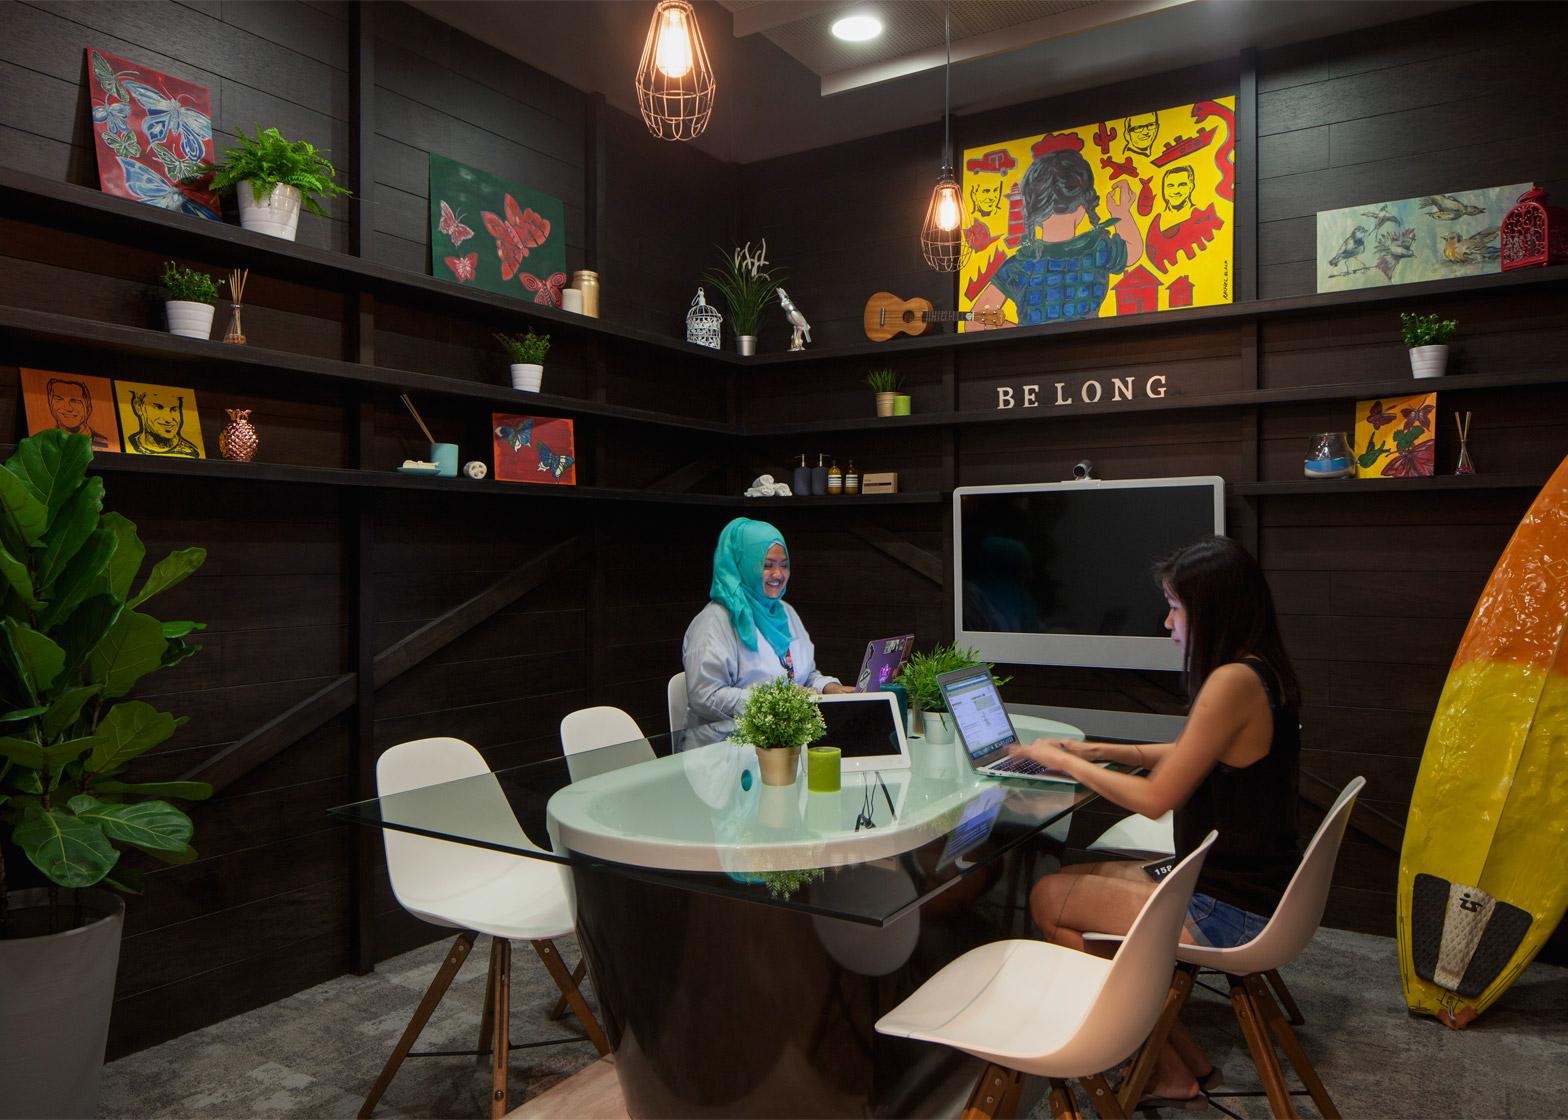 airbnb-offices-singapore-farm_dezeen_1568_4